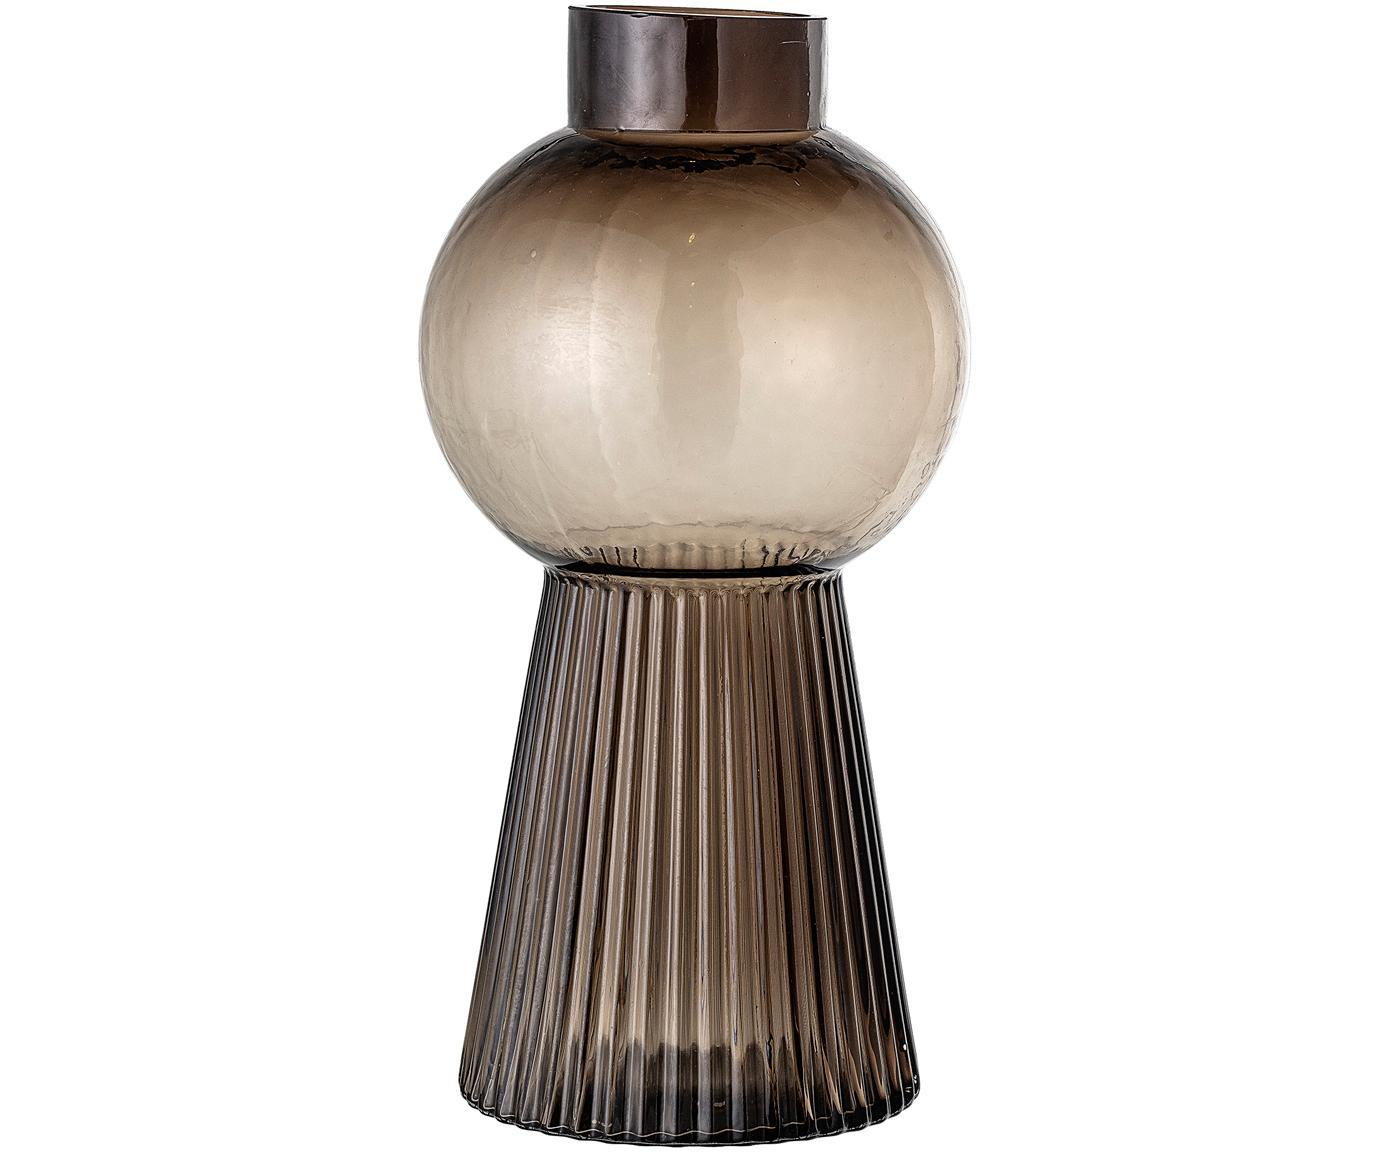 Grote glazen vaas Mola, Glas, Bruin, transparant, Ø 17 x H 34 cm